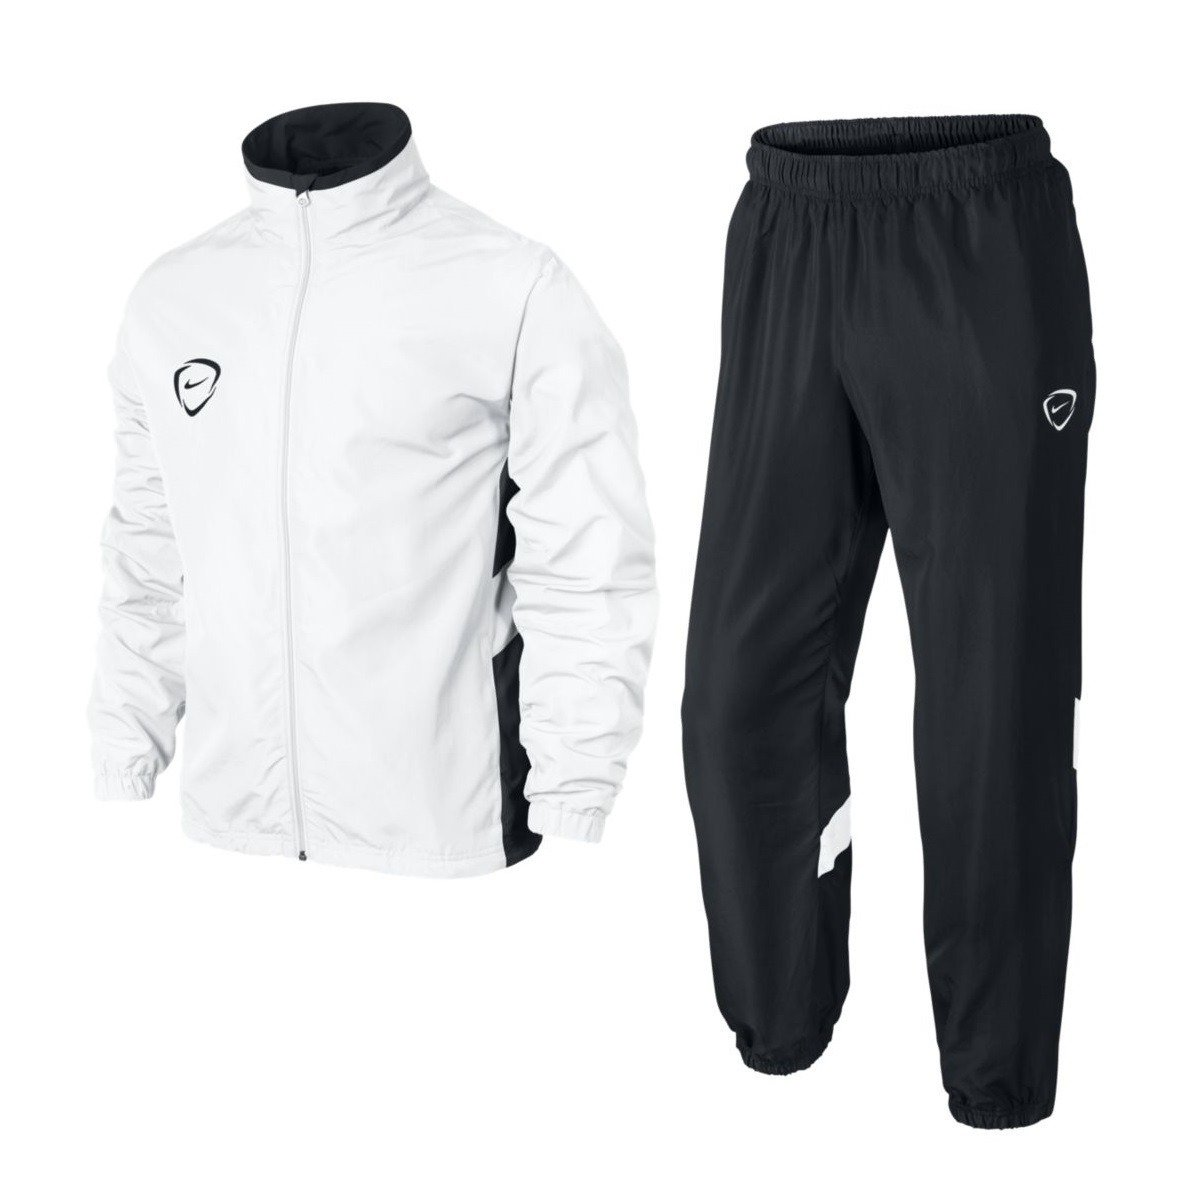 Nike Academy Wvn Wup - Chándal de fútbol para Hombre, Color Blanco ...